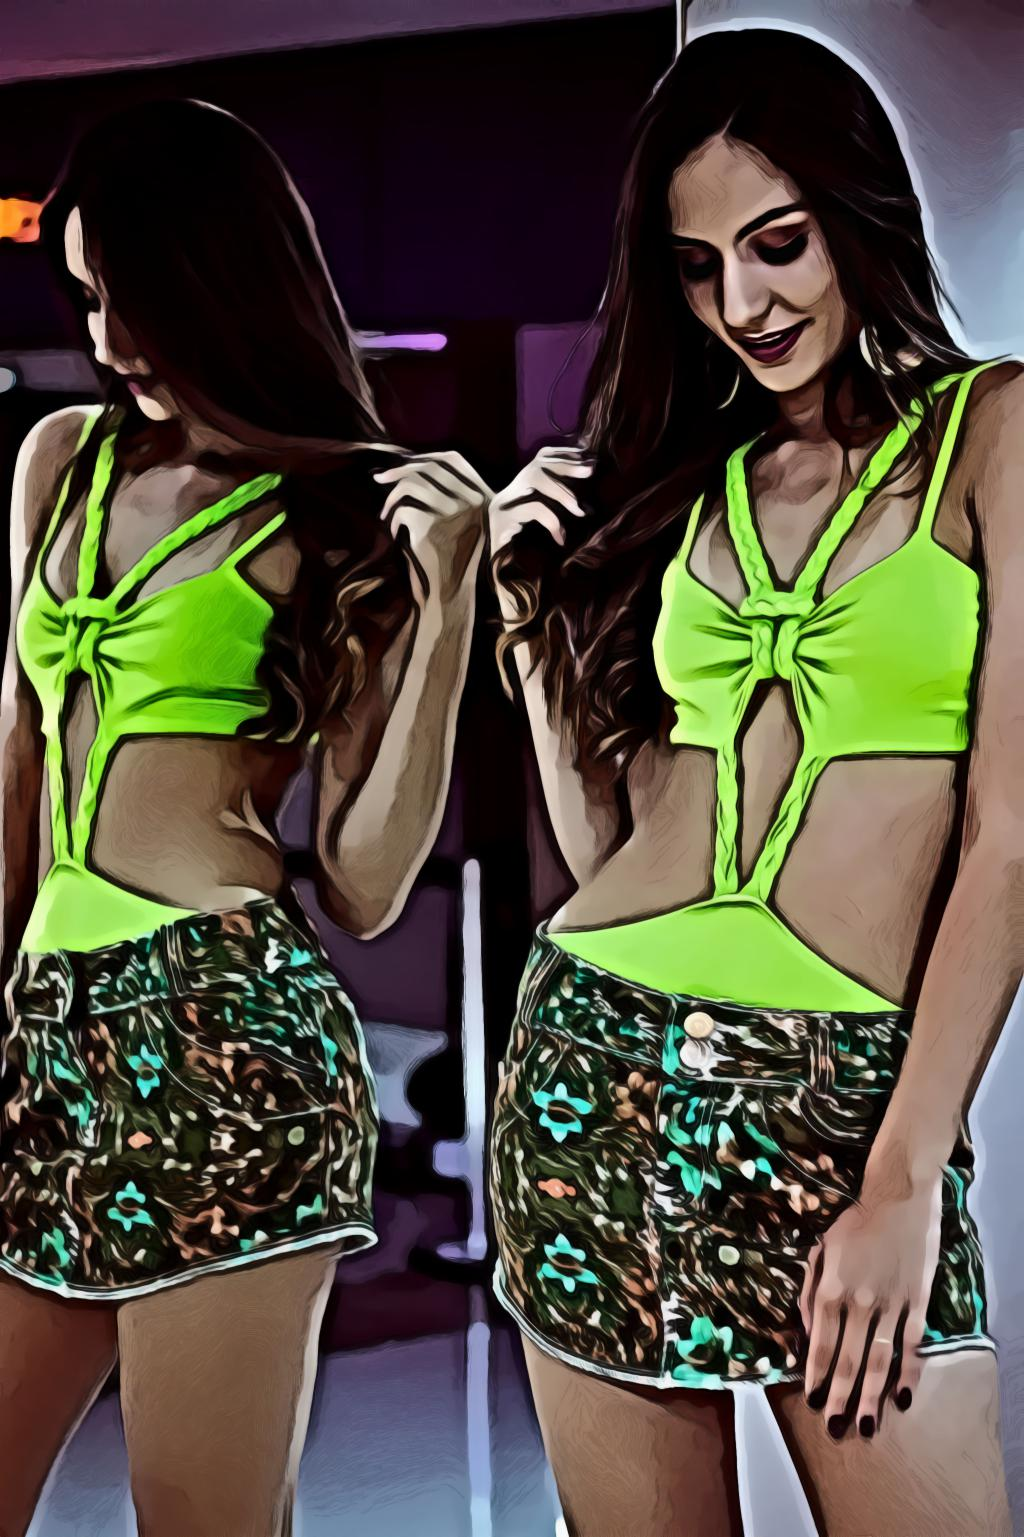 Woman wearing green sleeveless mini dress near the mirror